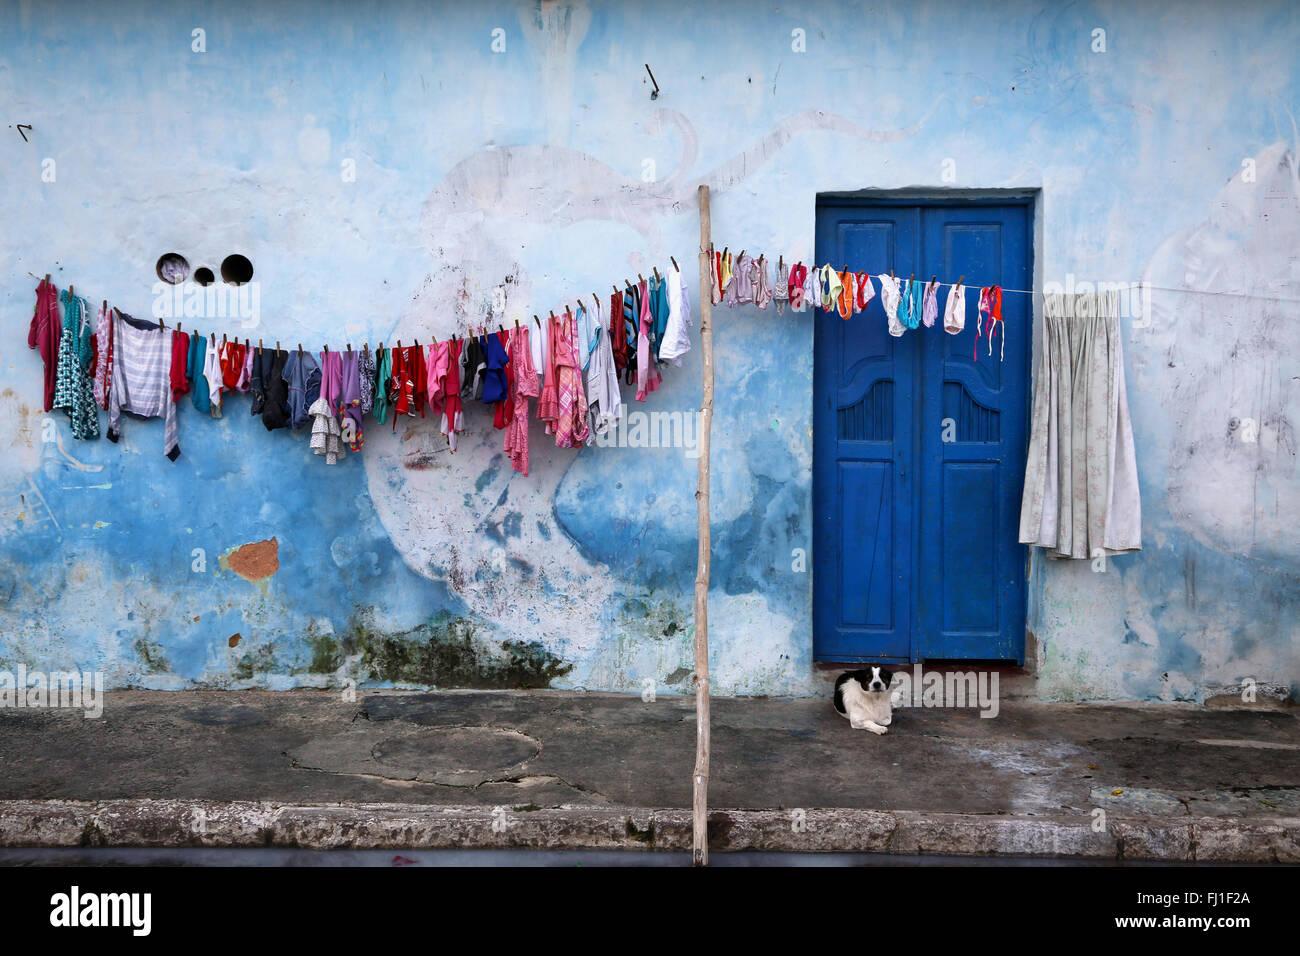 La arquitectura de la casa en Cachoeira, Bahía, Brésil Brasil Imagen De Stock